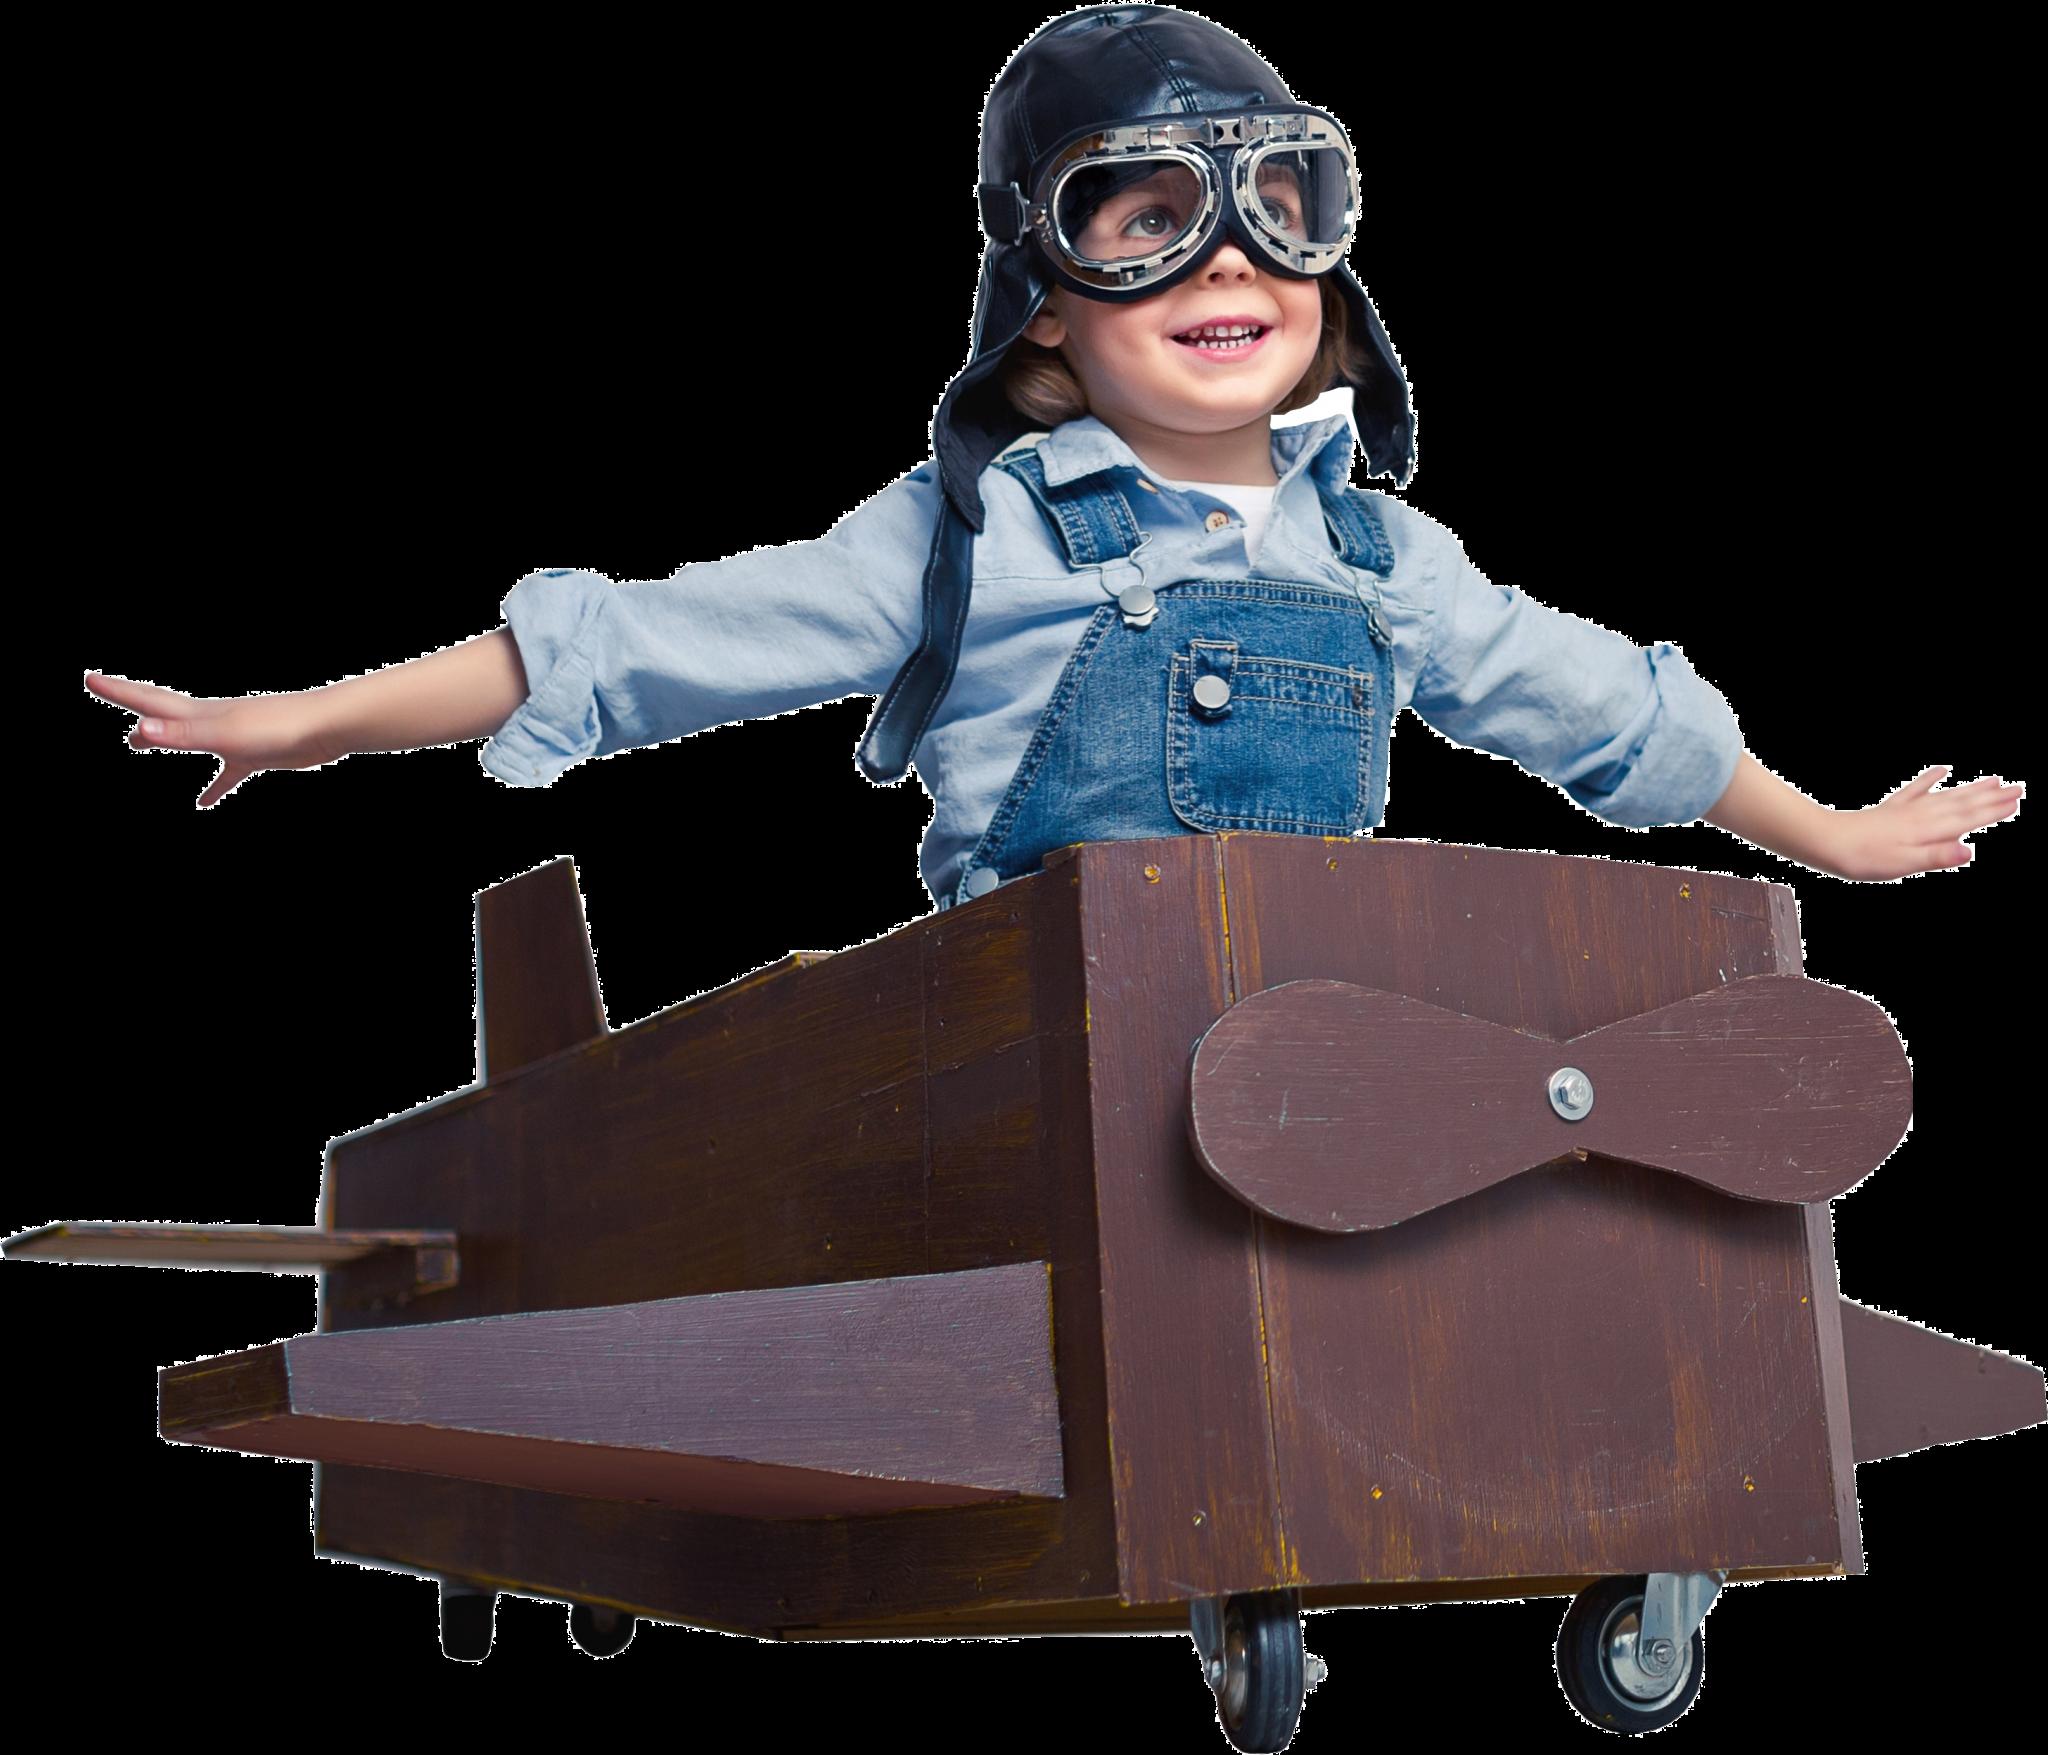 Cheqdin-Flying-Boy